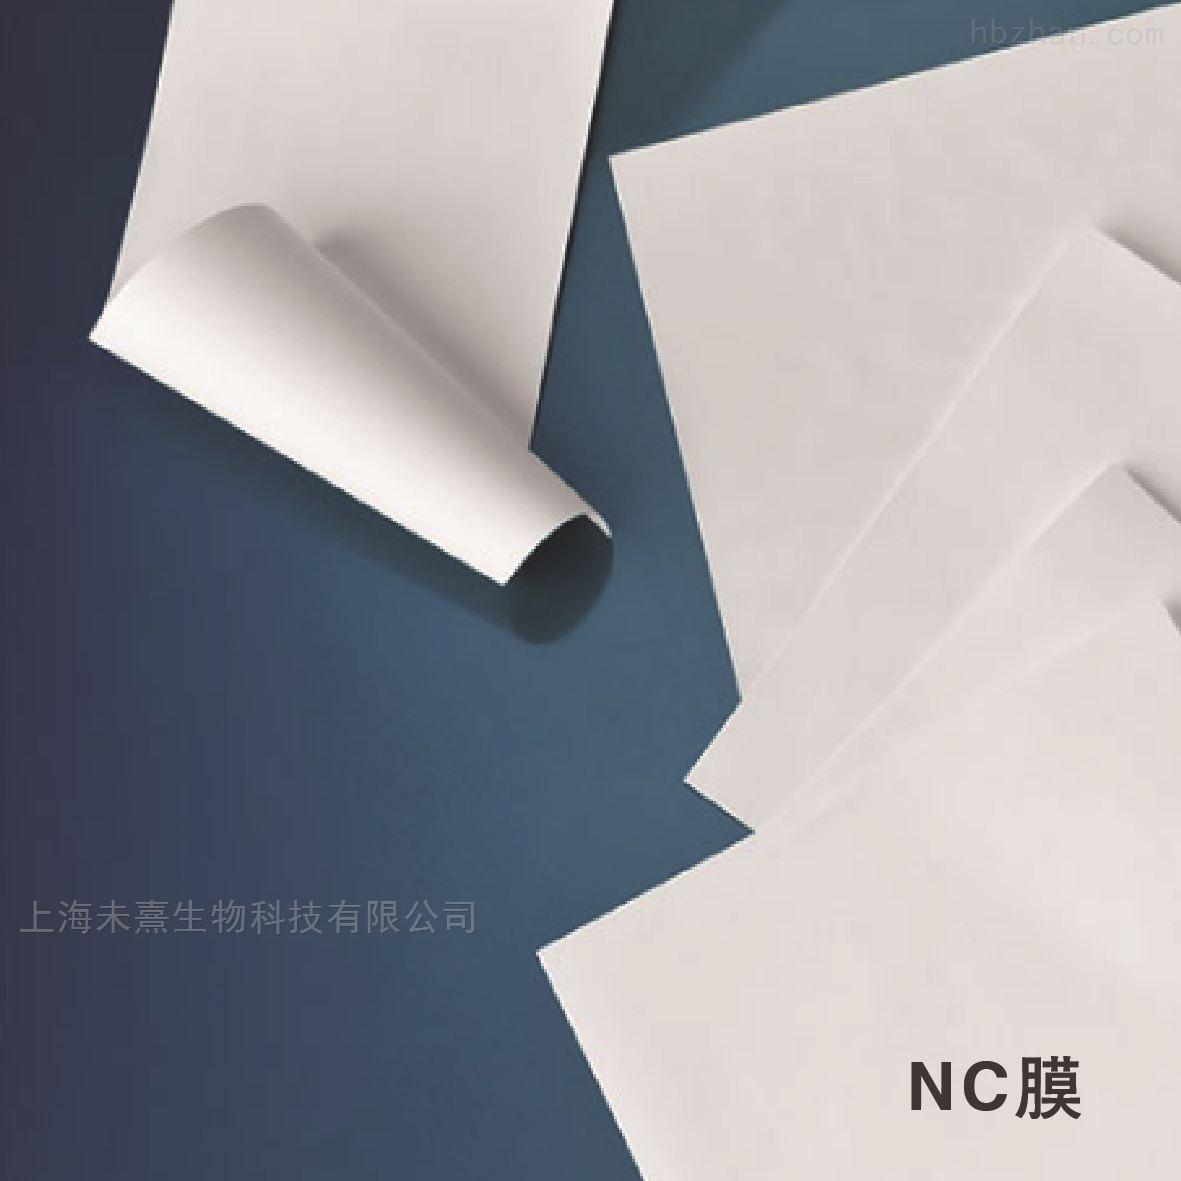 GVS 醋酸纤维素网格状 NC膜0.22um*142mm